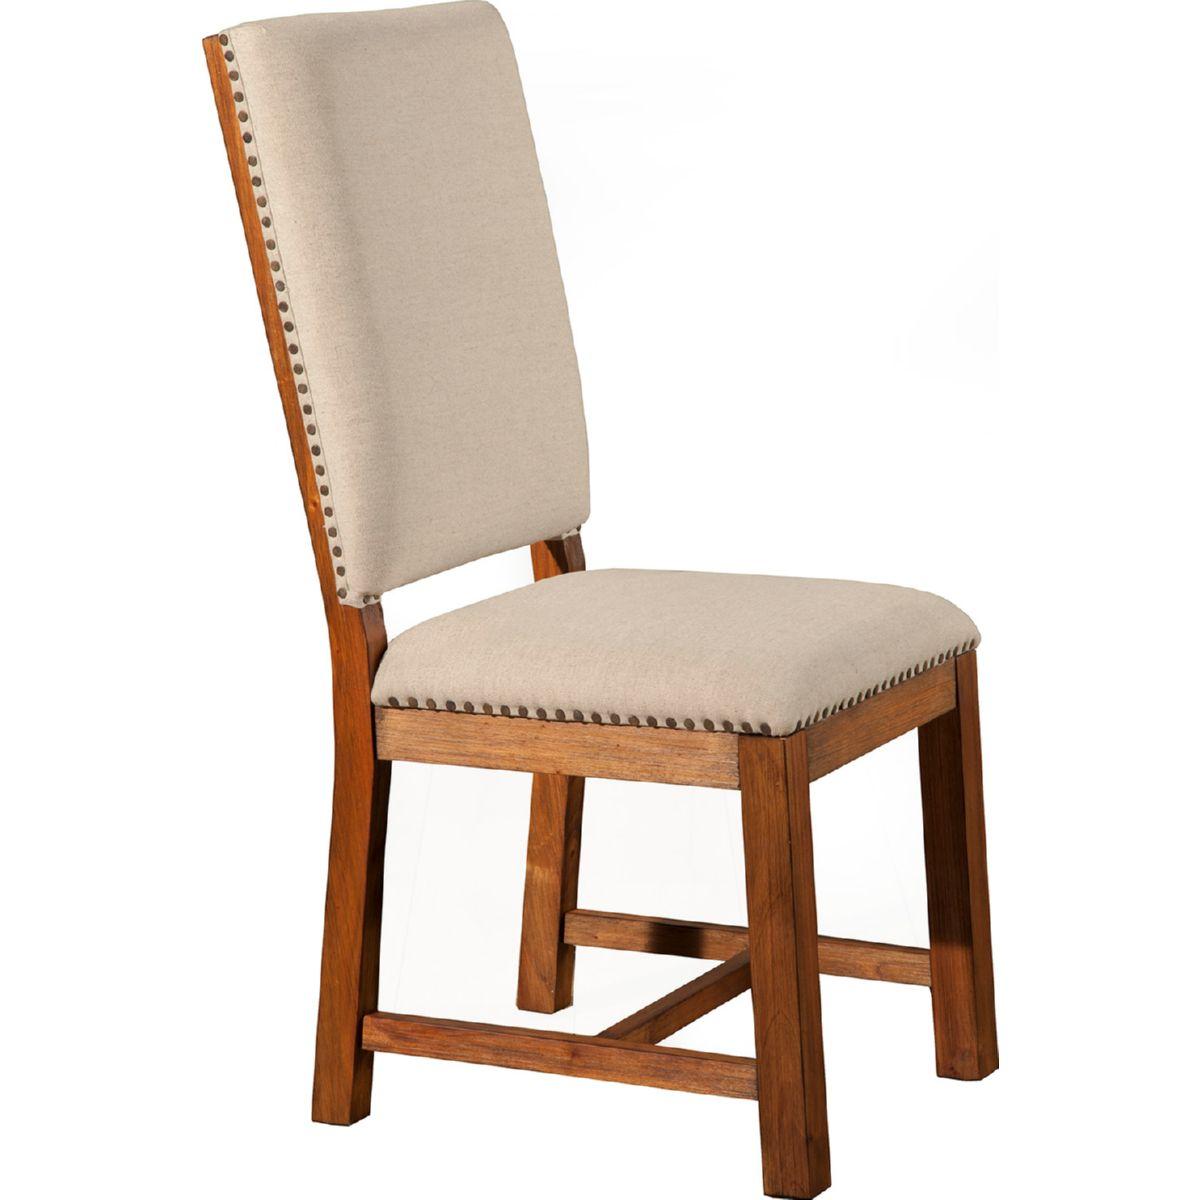 Prime Shasta Upholstered Dining Chair In Salvaged Natural Mahogany Set Of 2 By Alpine Furniture Spiritservingveterans Wood Chair Design Ideas Spiritservingveteransorg